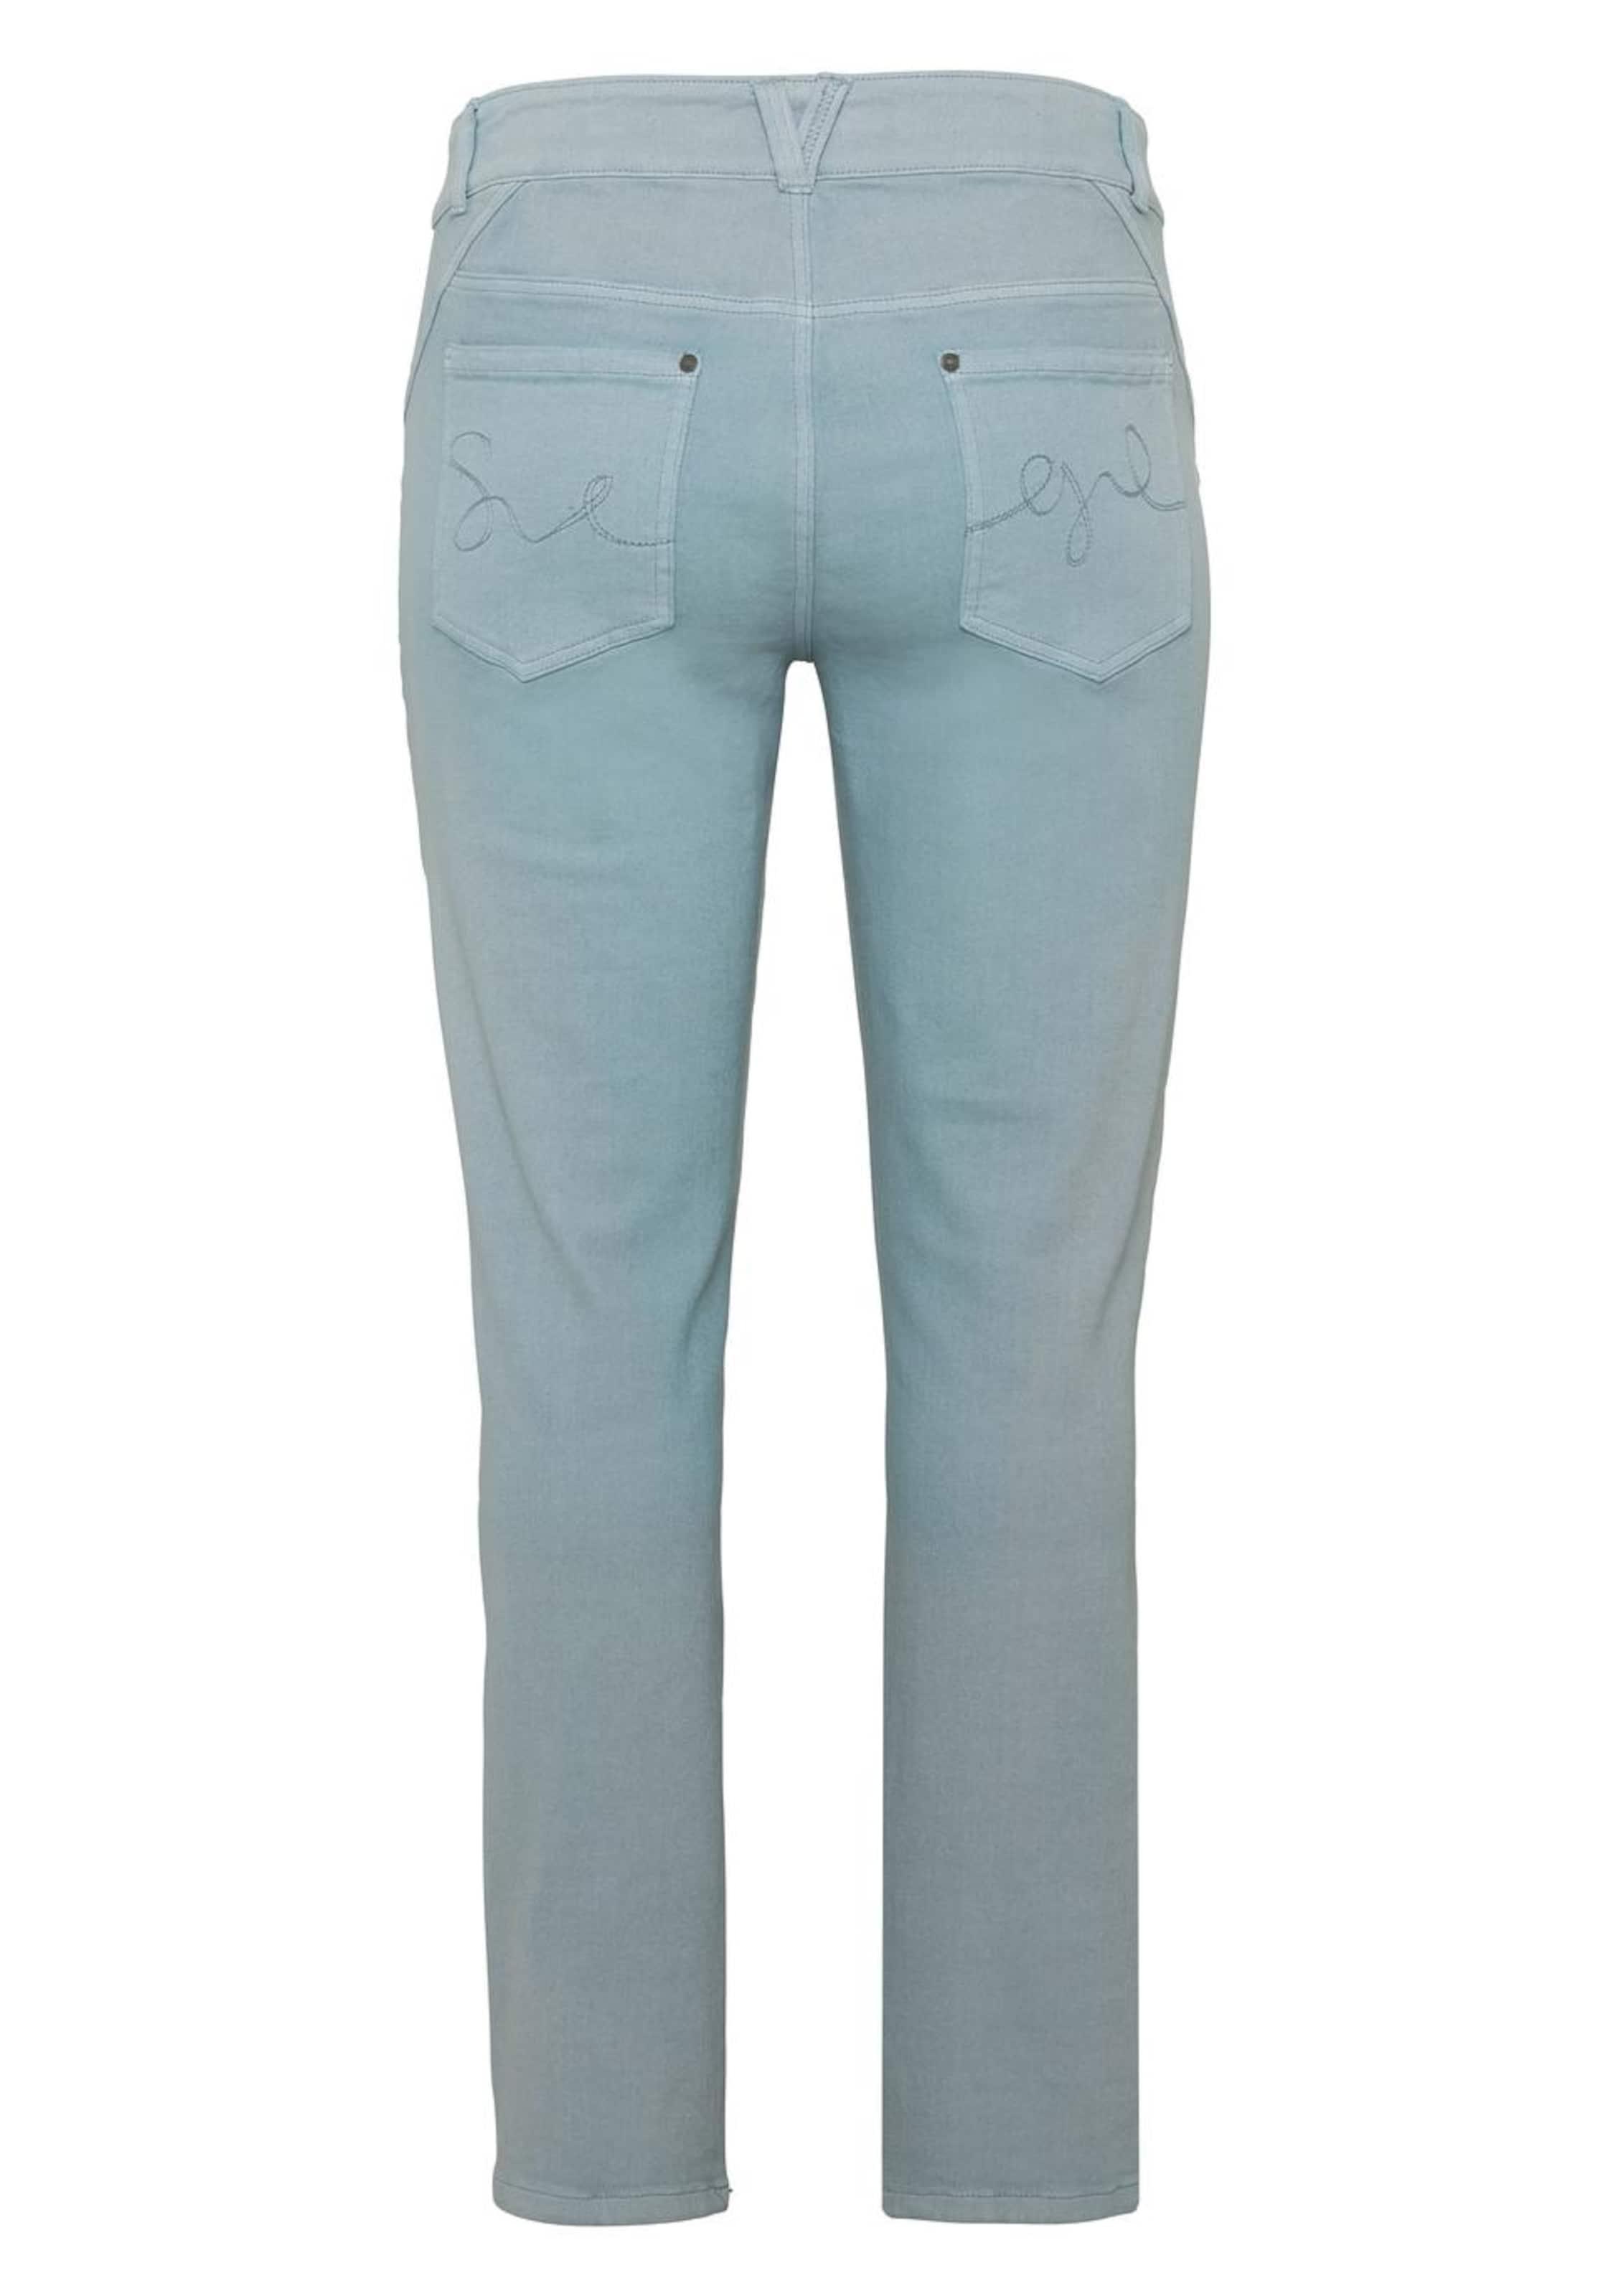 Sheego Jeans Sheego In Jeans Pastellblau In In Pastellblau Sheego Jeans 9bWEeYD2HI